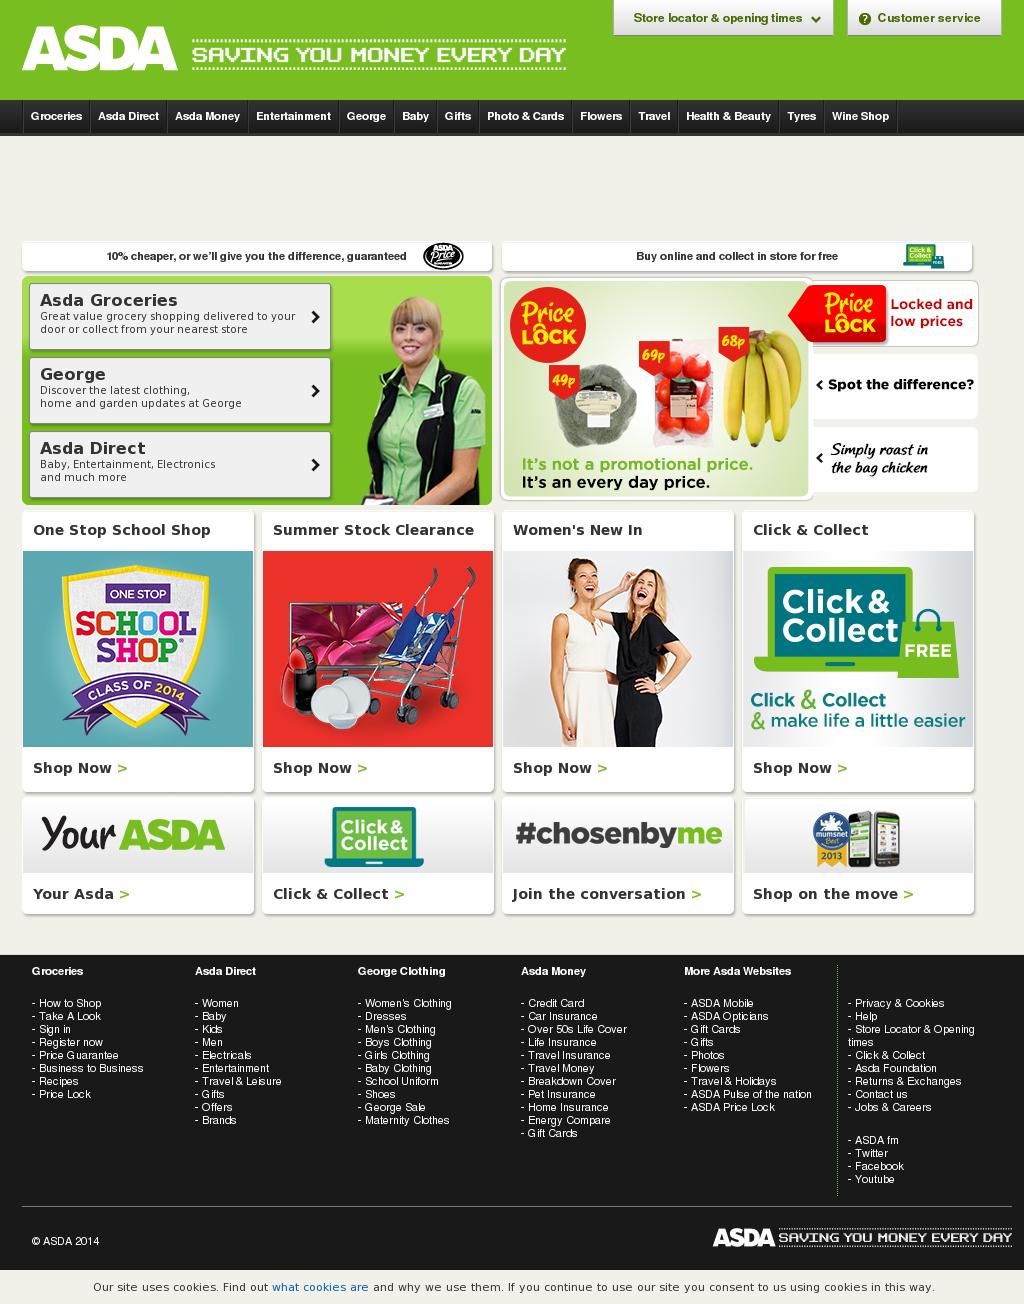 e93420d260 ASDA Competitors, Revenue and Employees - Owler Company Profile